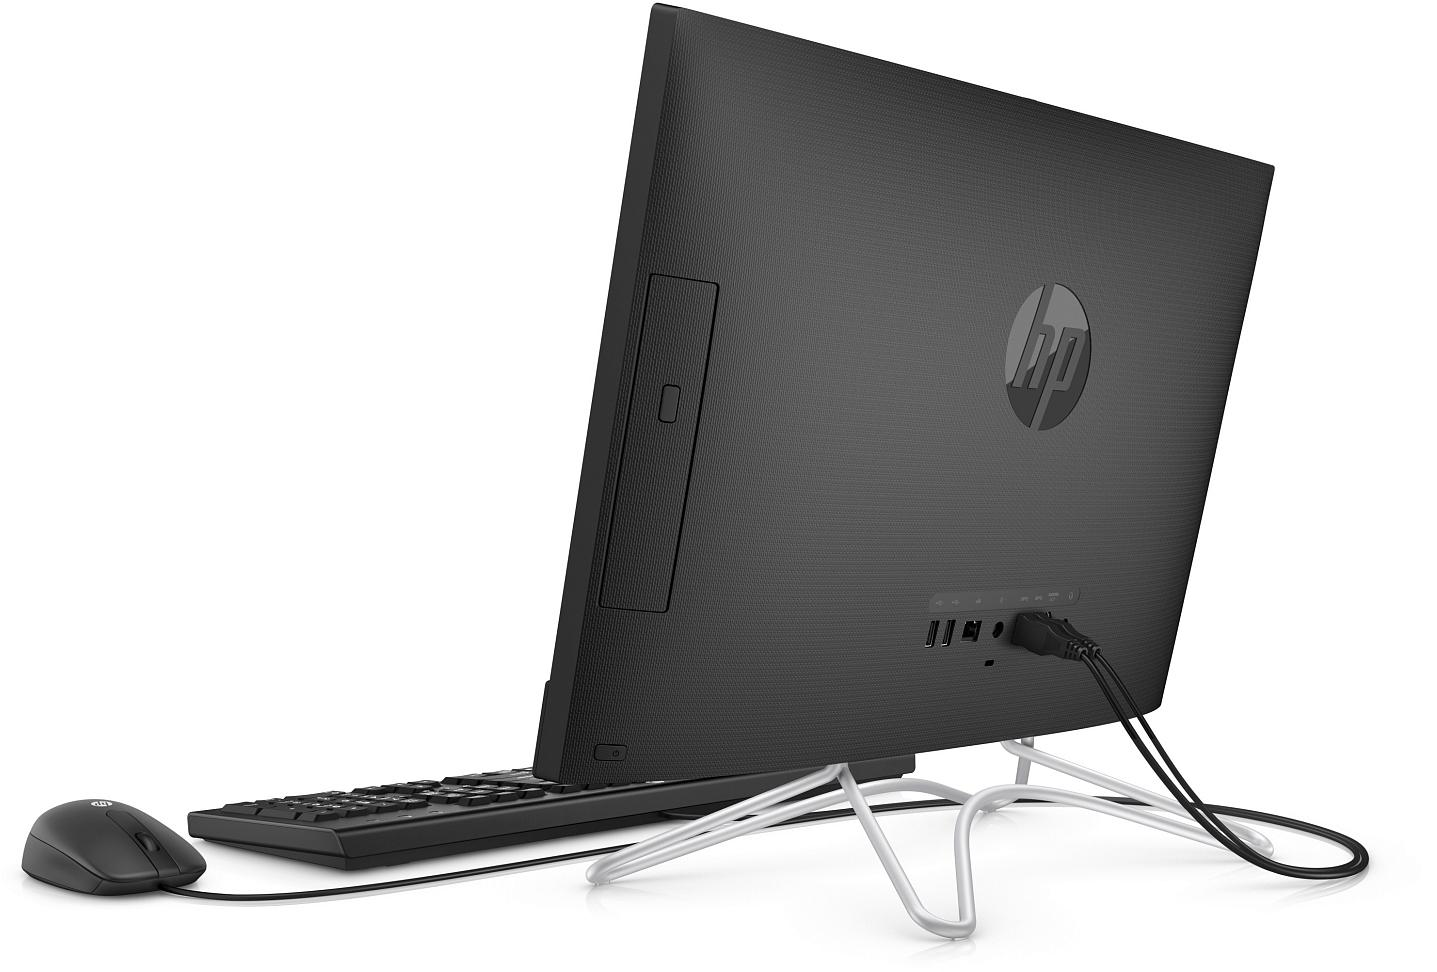 Купить Моноблок HP 200 G3 (3VA36EA) фото 2